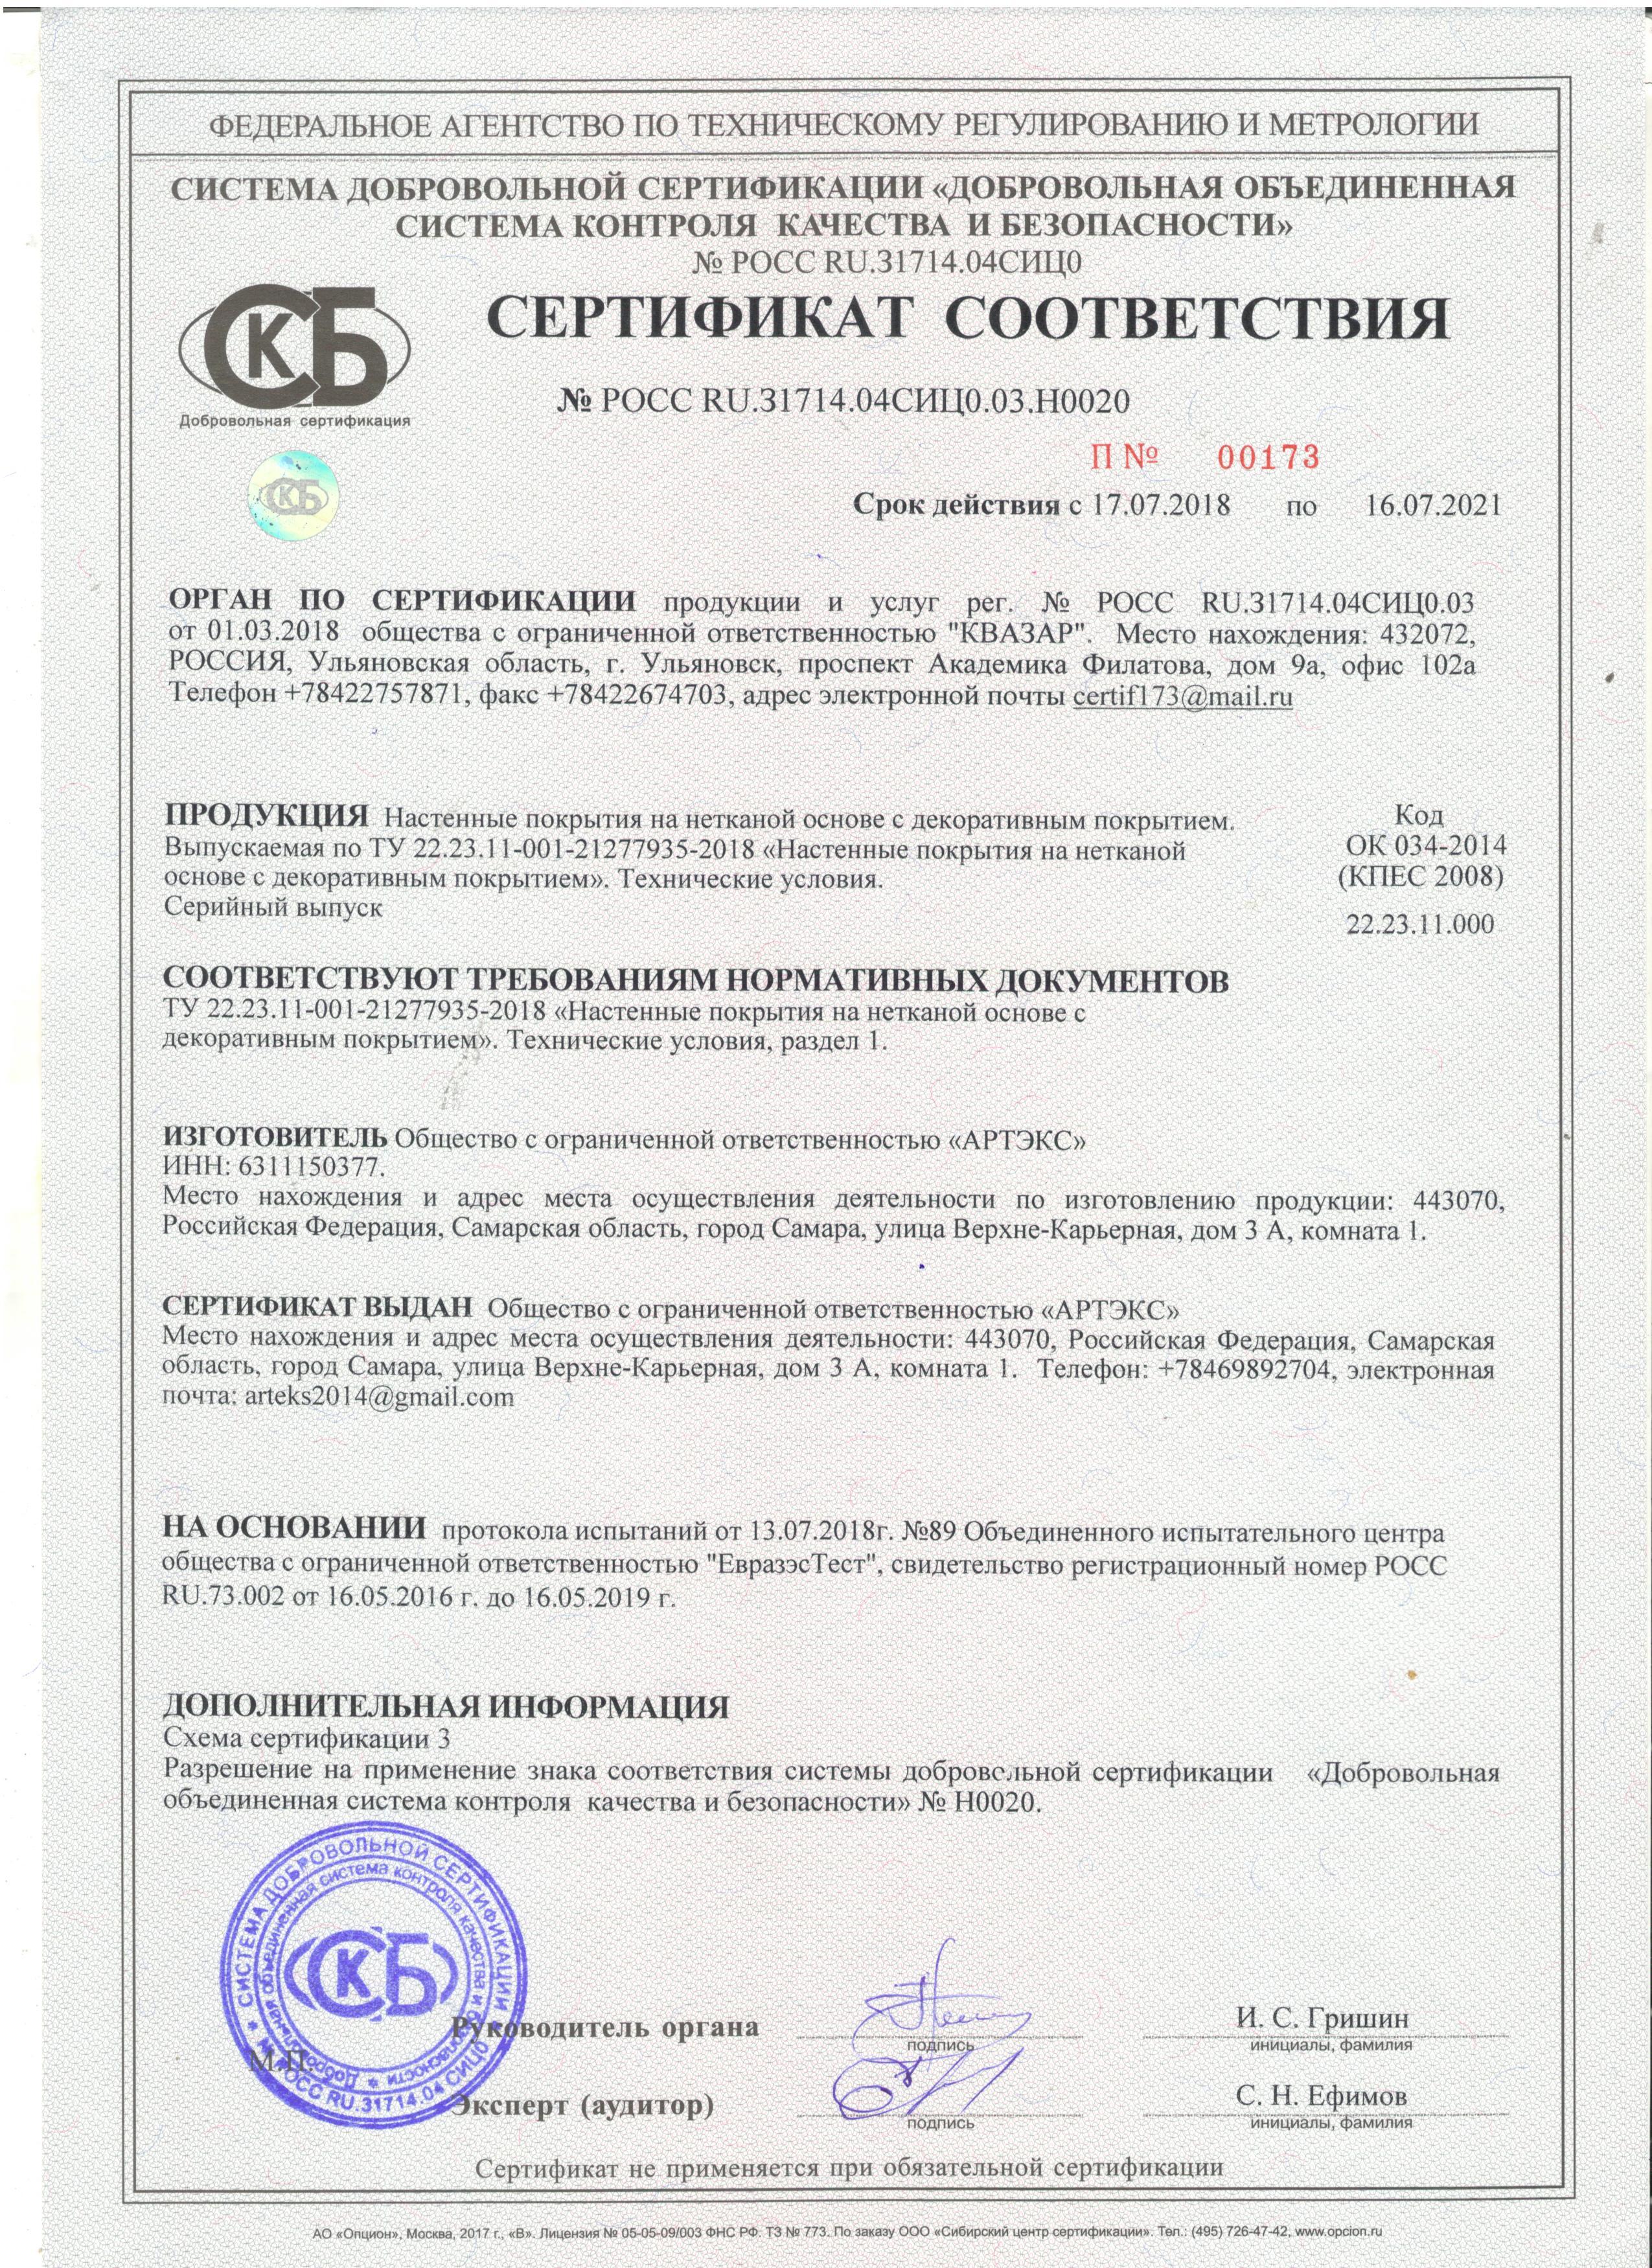 Сертификат_соответствия_фрески